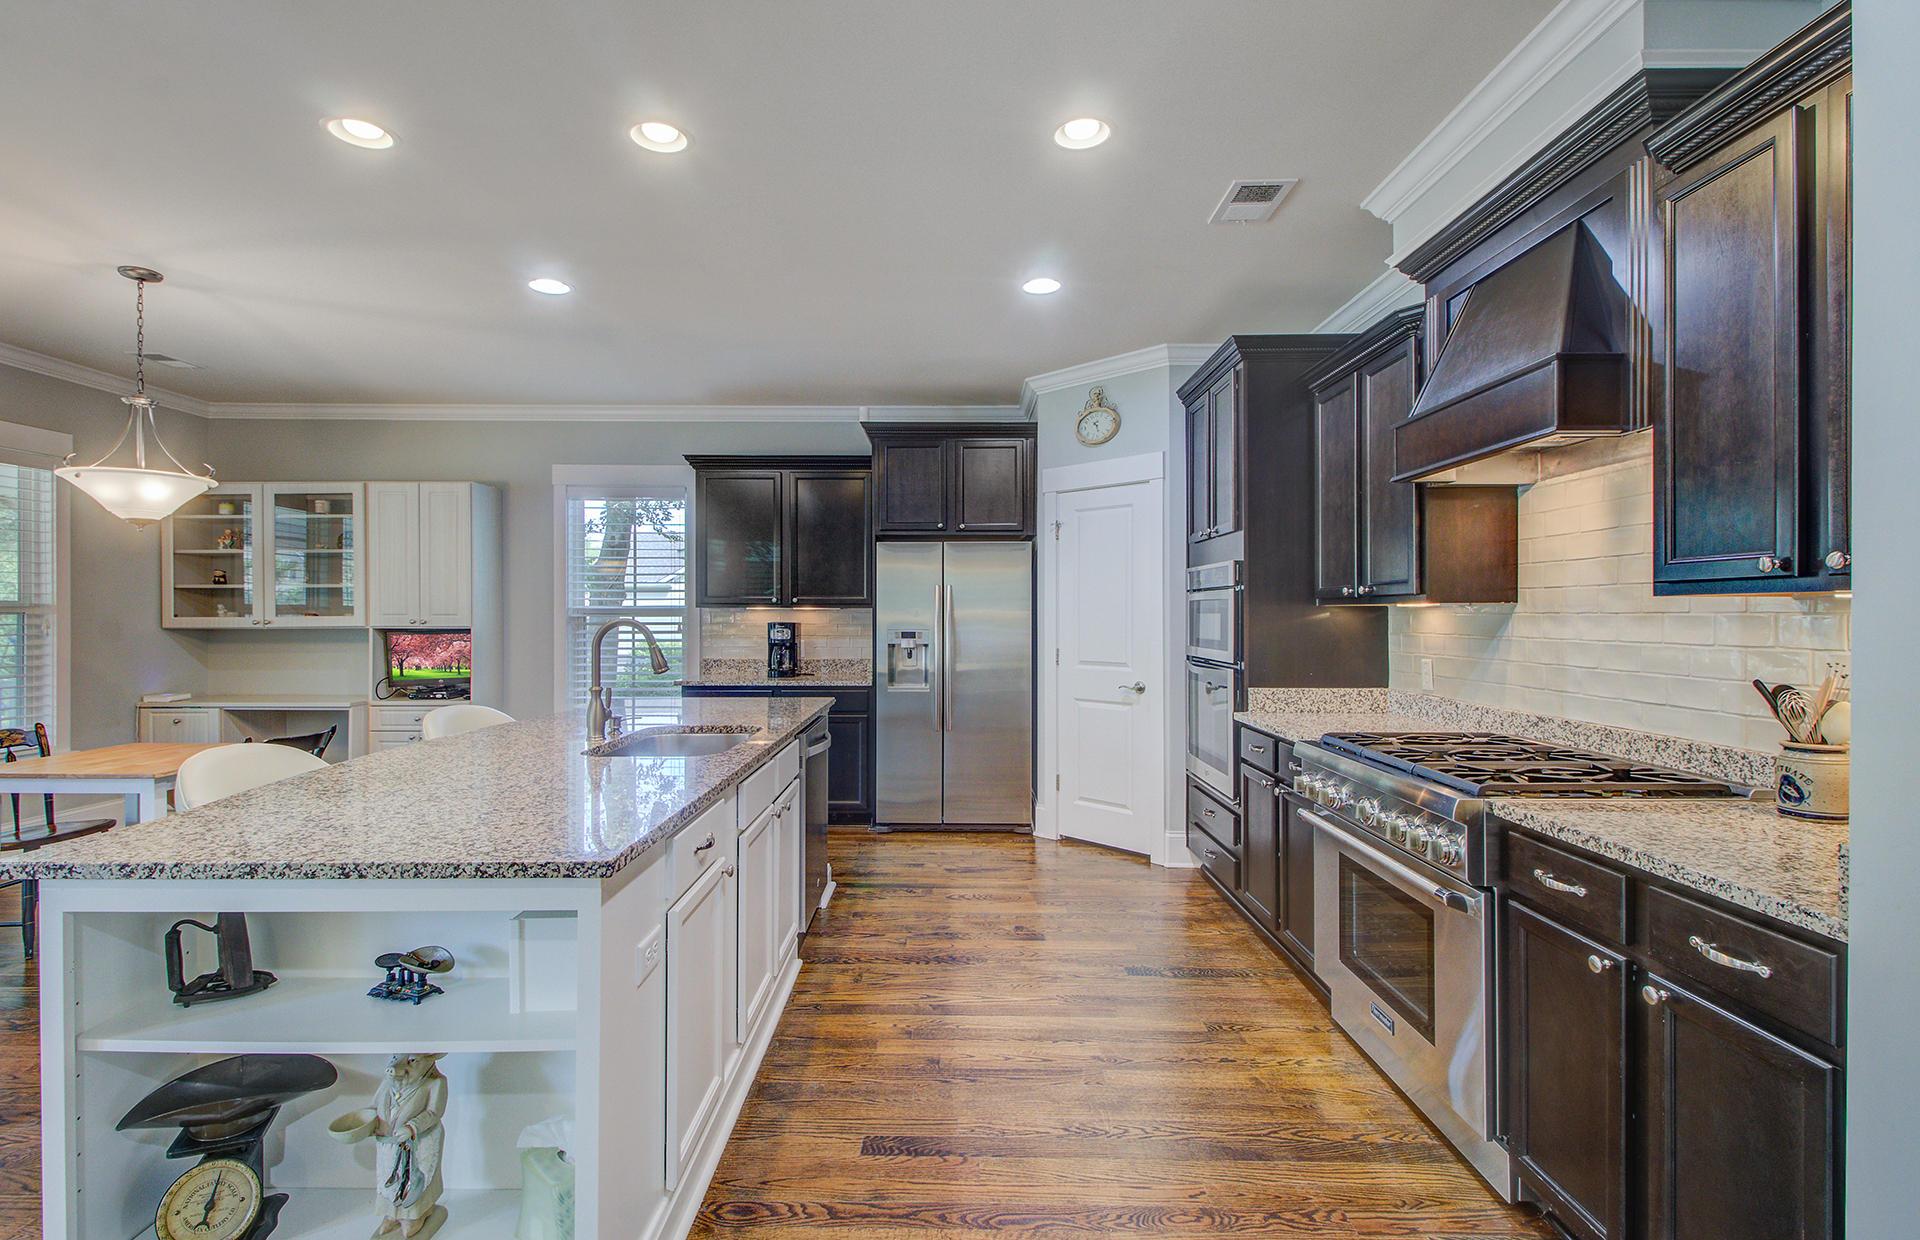 Scotts Creek Homes For Sale - 1404 Scotts Creek, Mount Pleasant, SC - 27